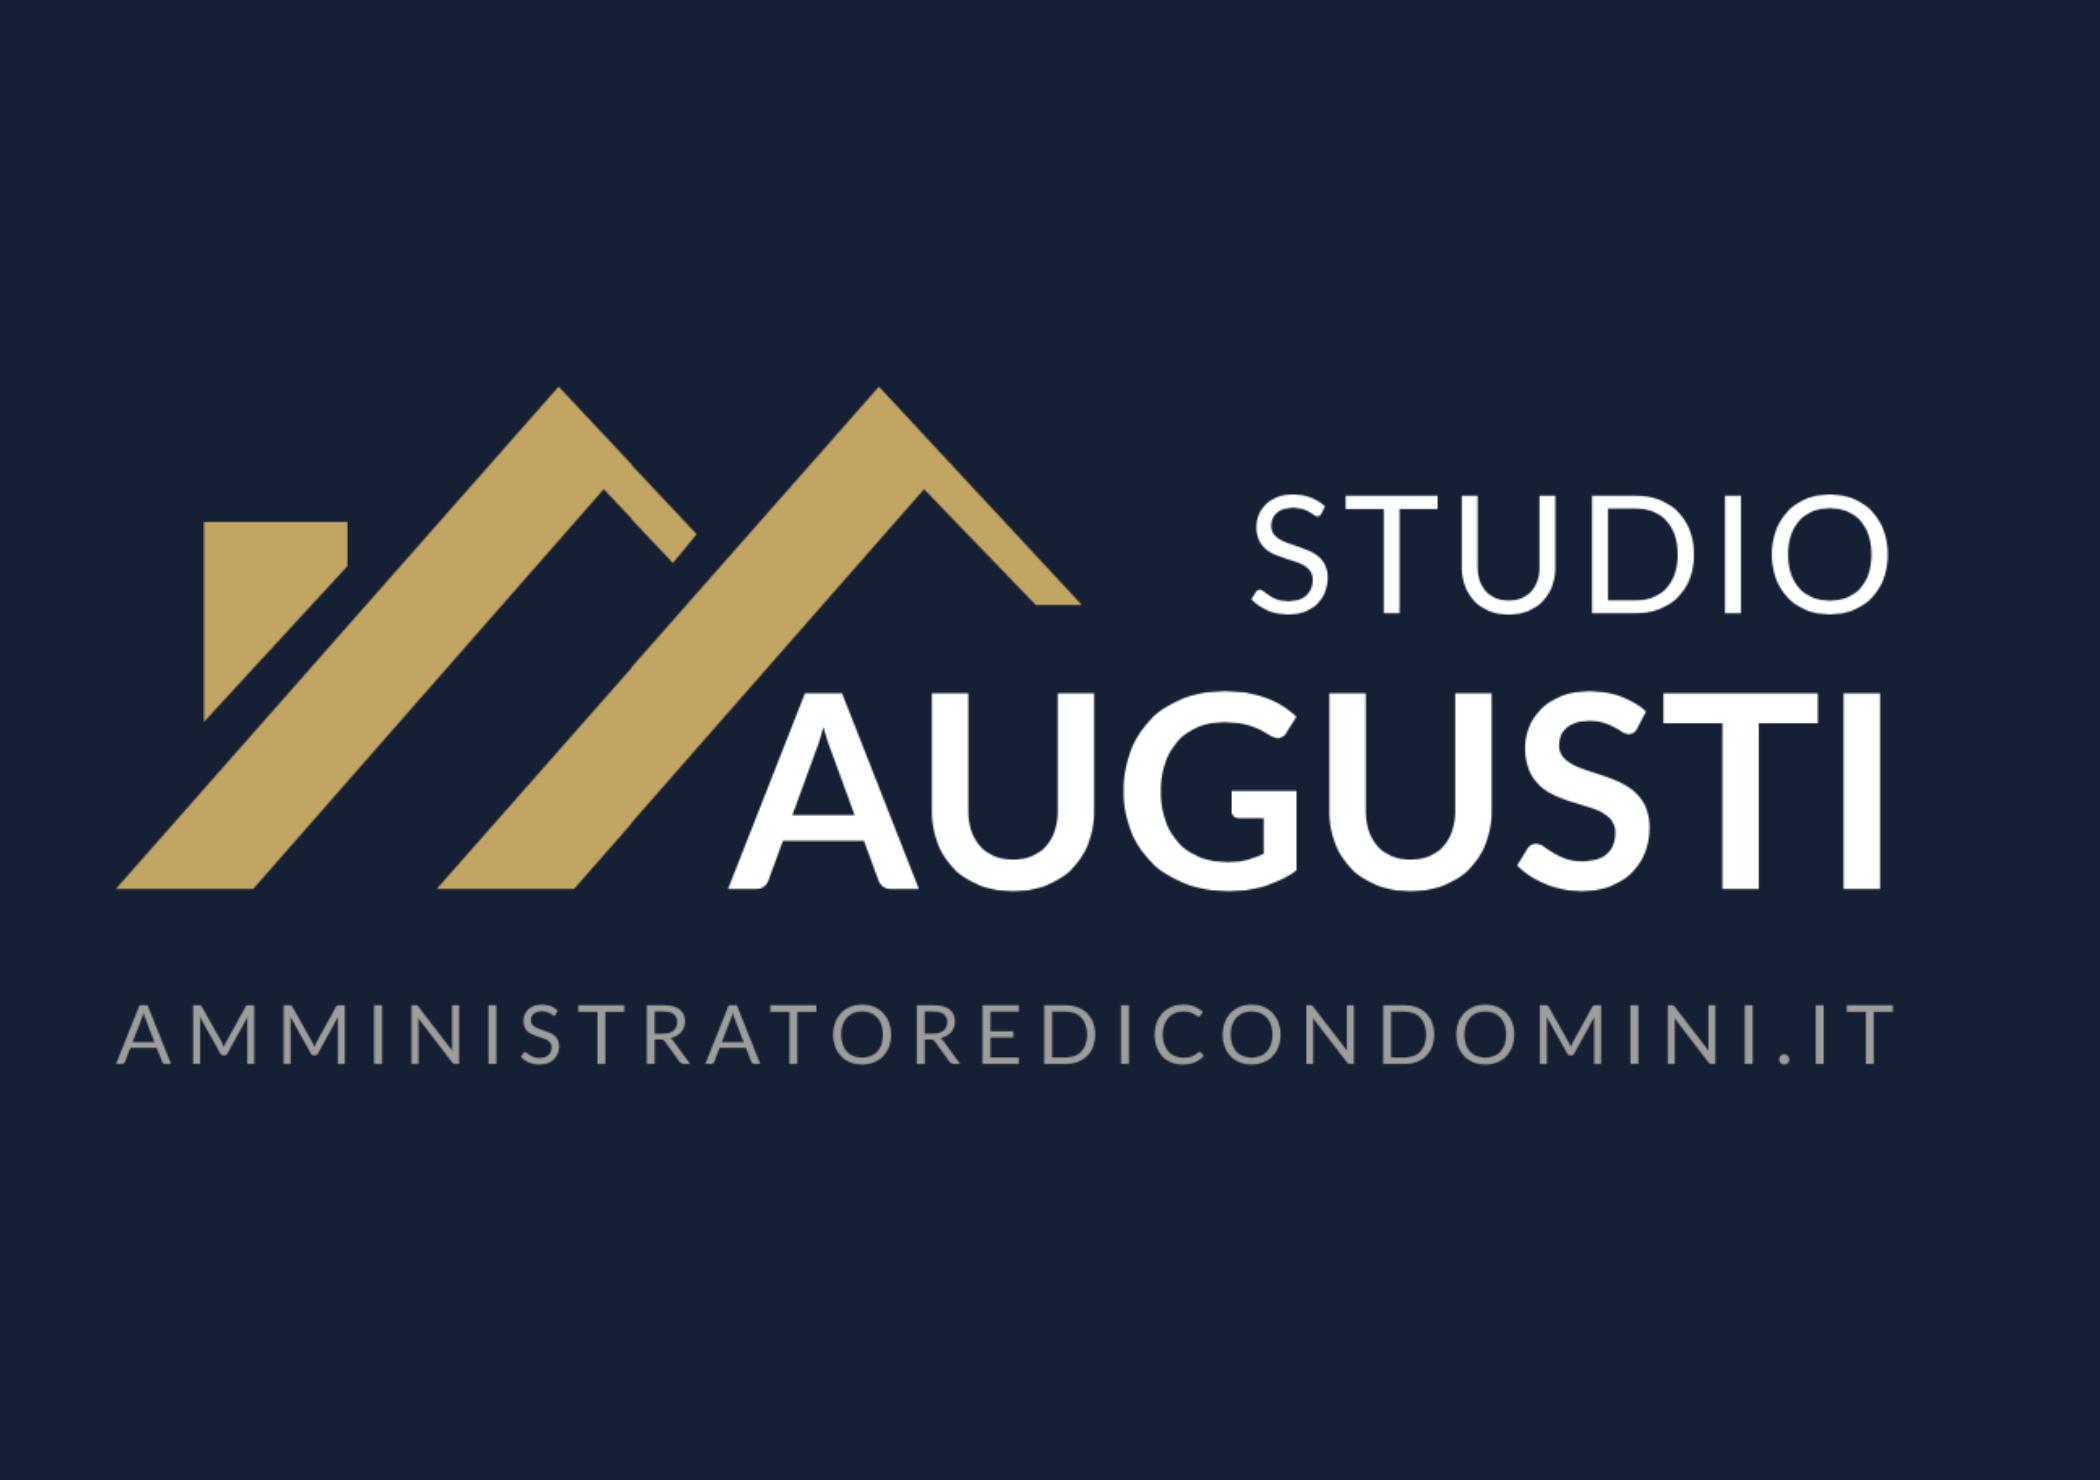 www.amministratoredicondomini.it